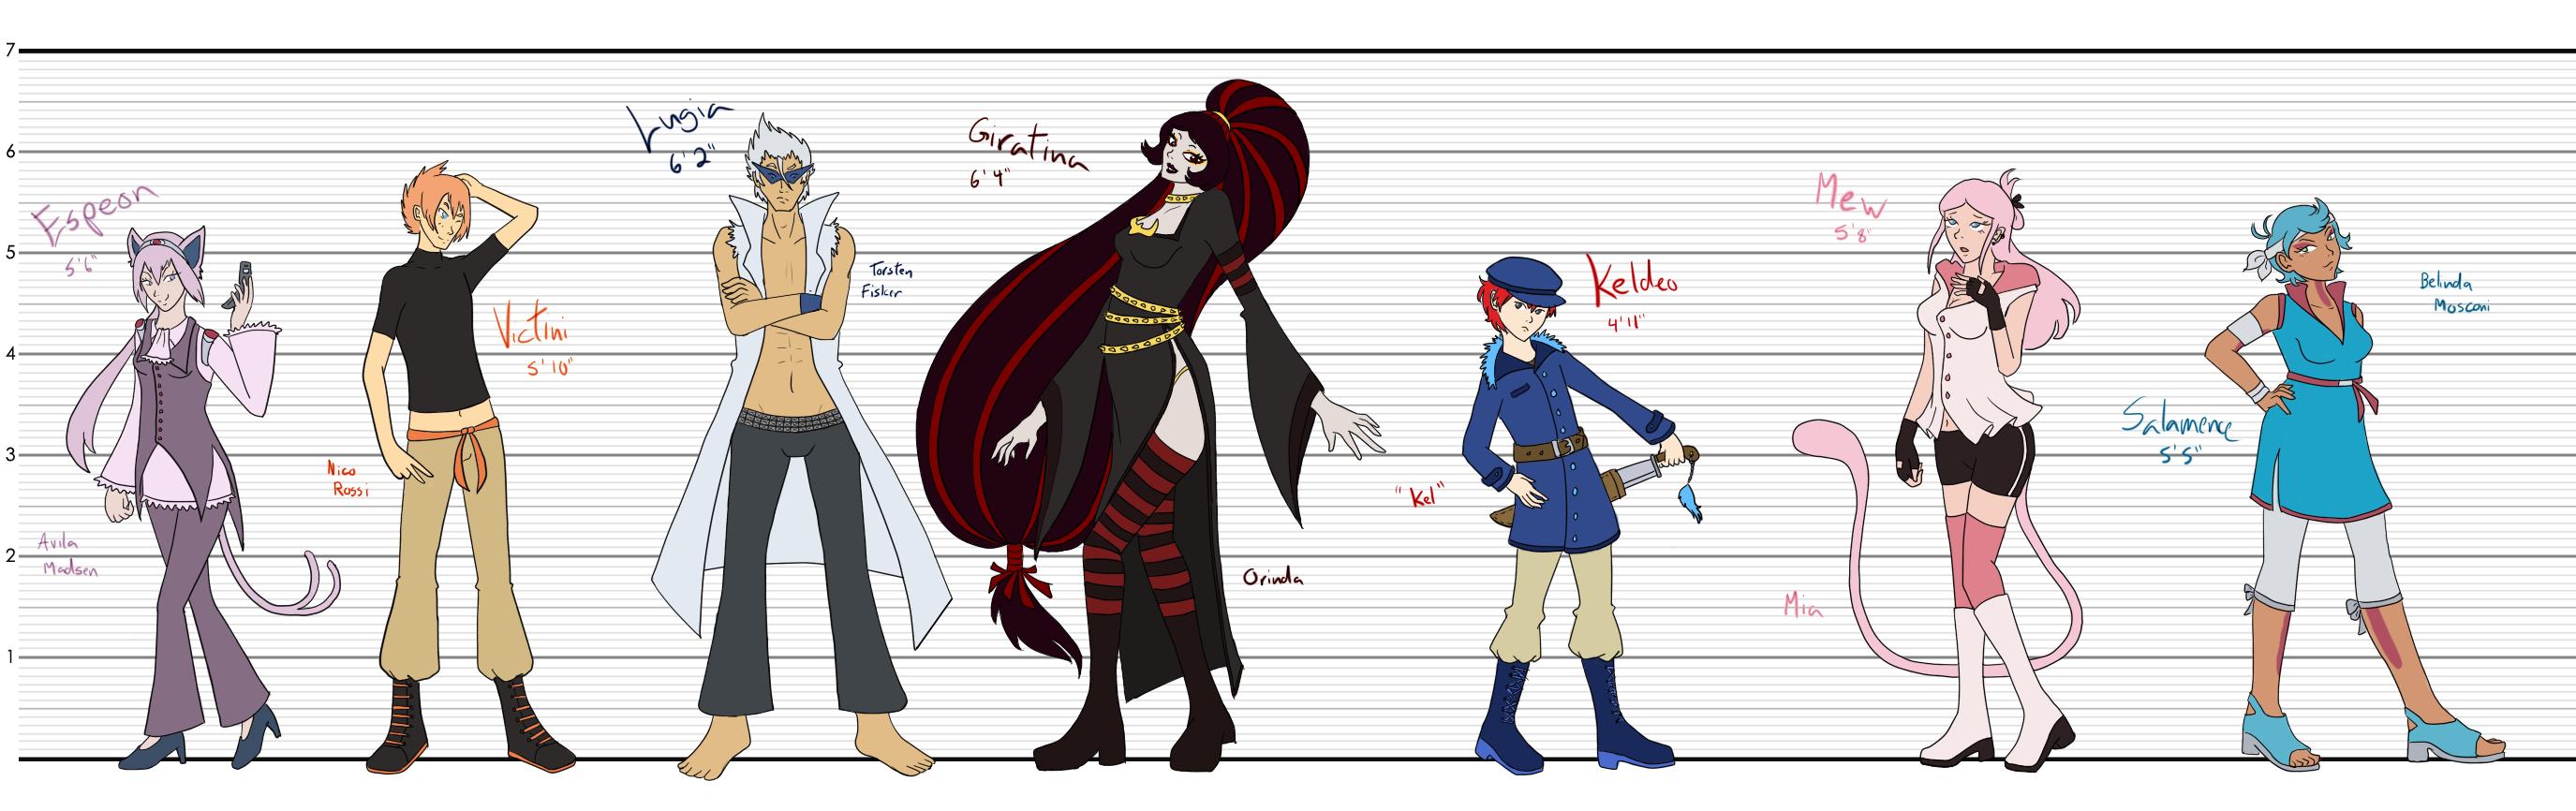 Anime Characters 169 Cm : Eksperi height chart by mintmouse on deviantart